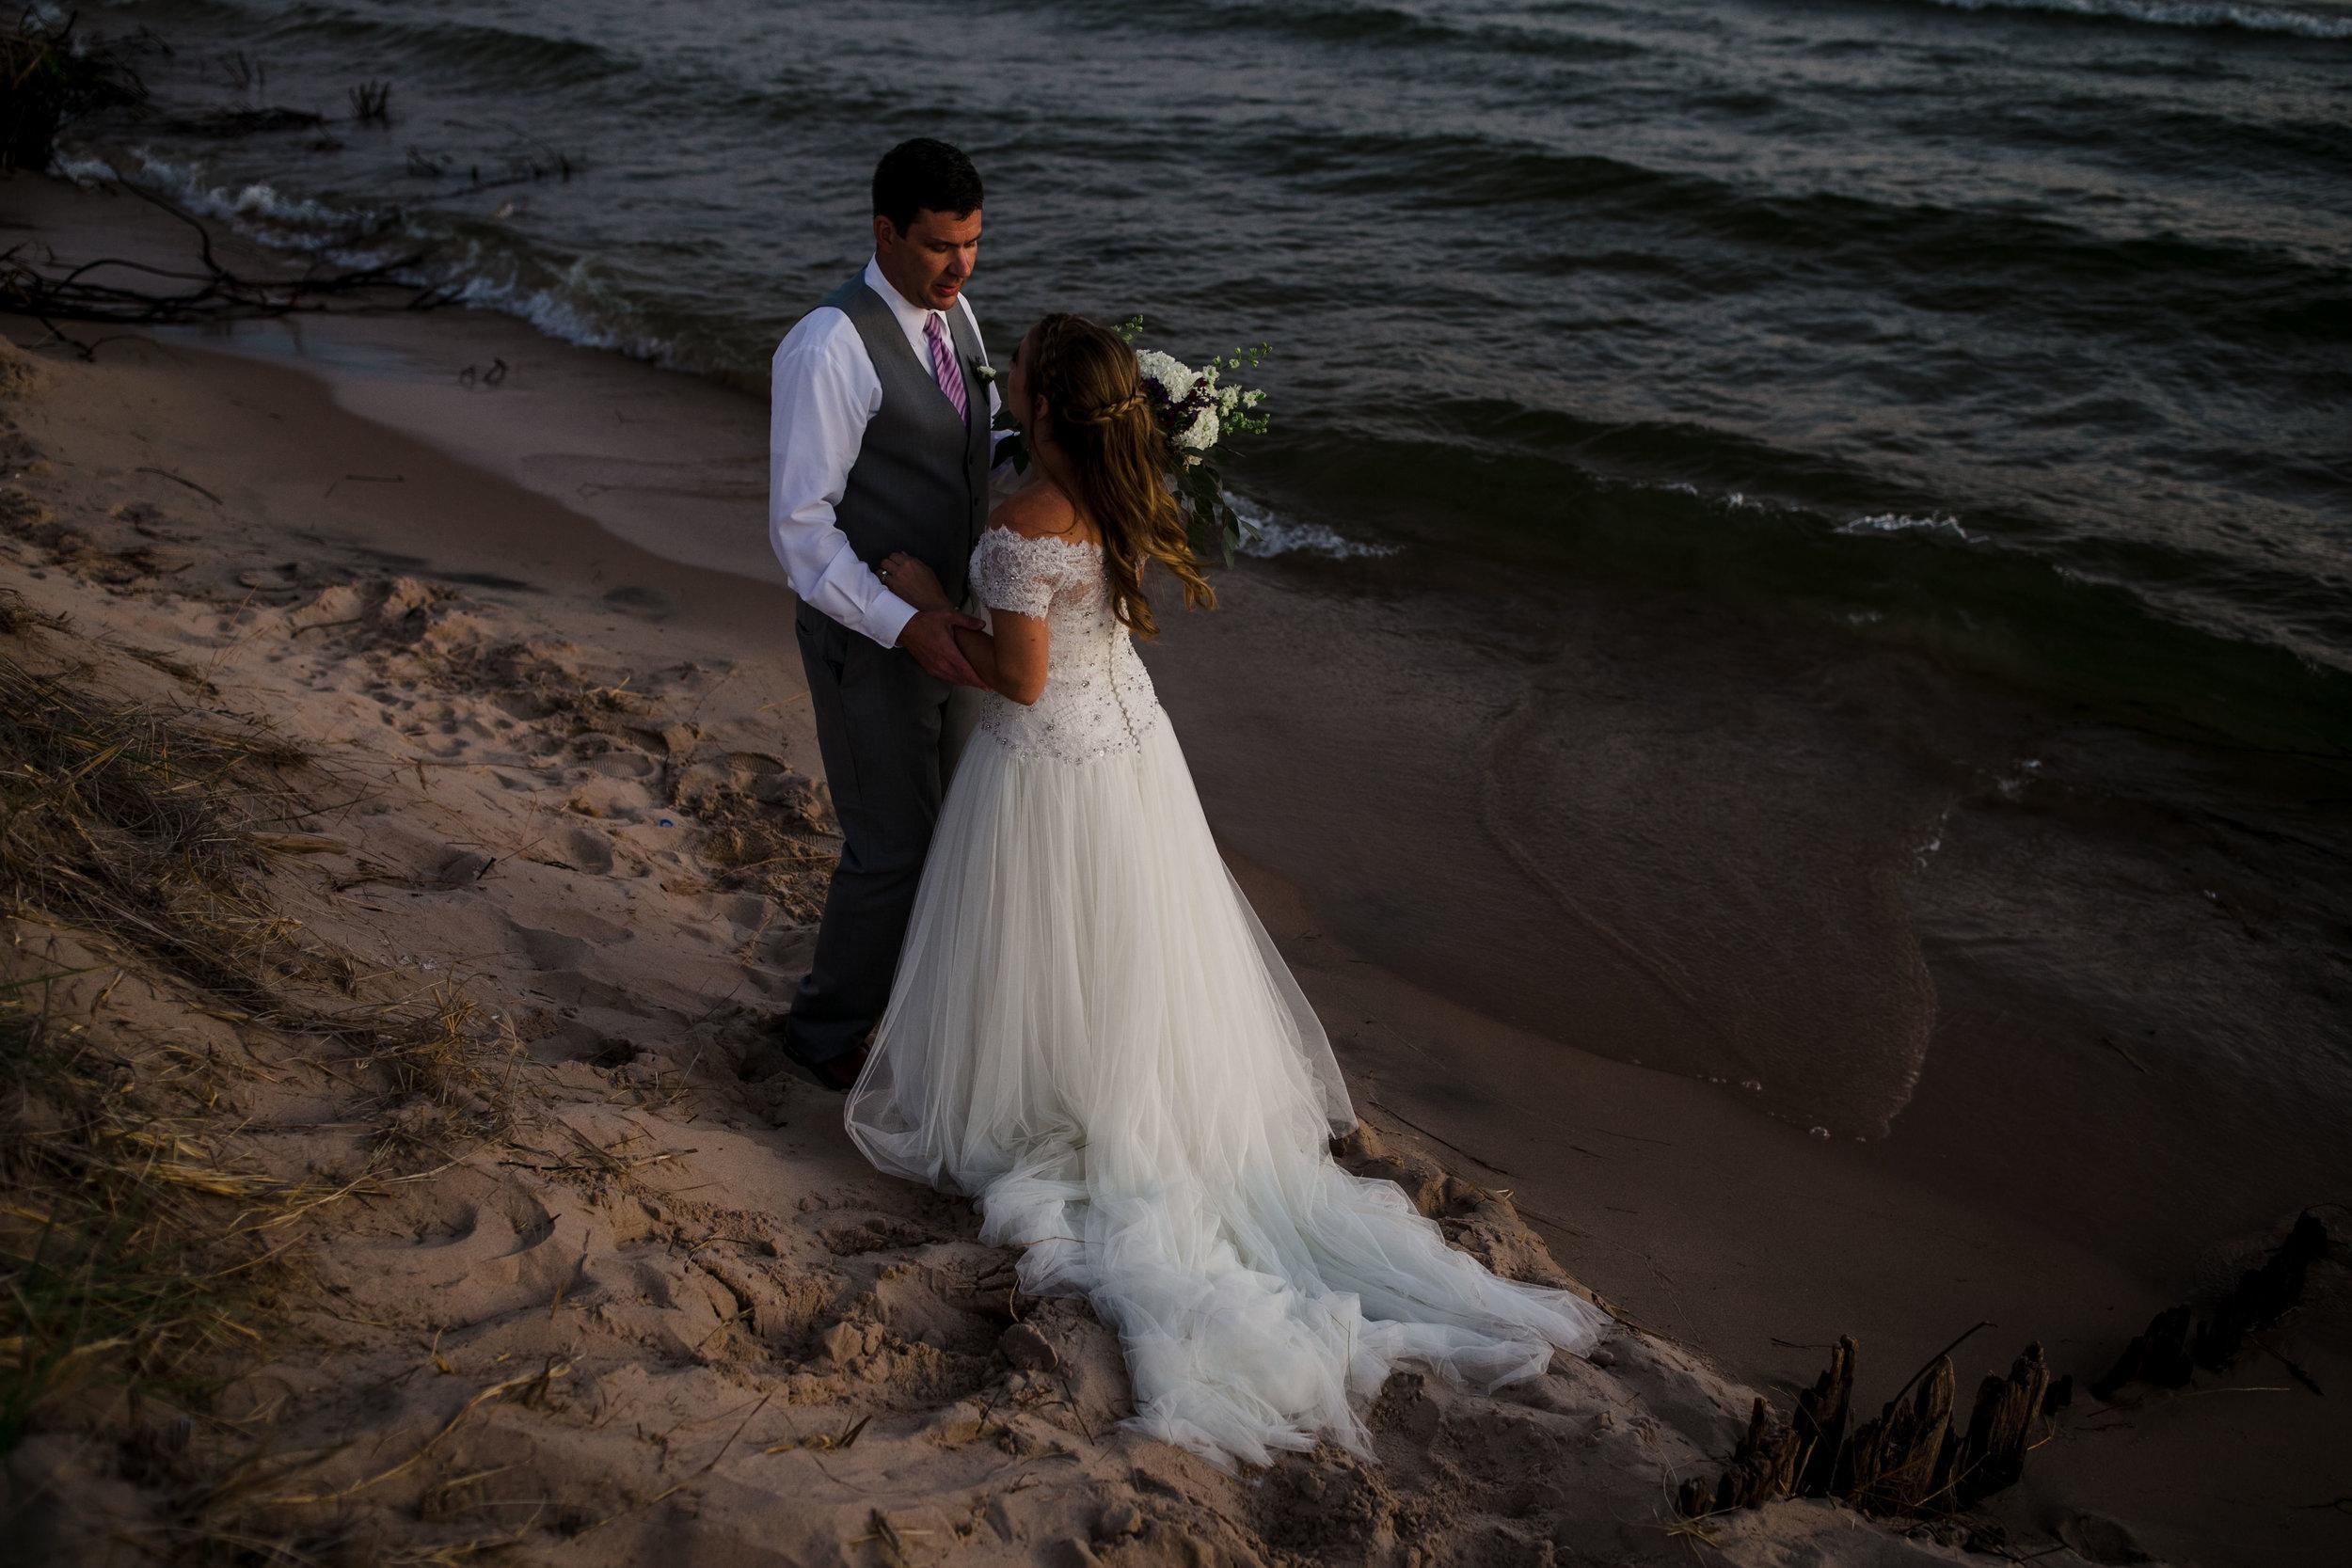 ludington-michigan-intimate-backyard-wedding-jessica-nolan511.jpg